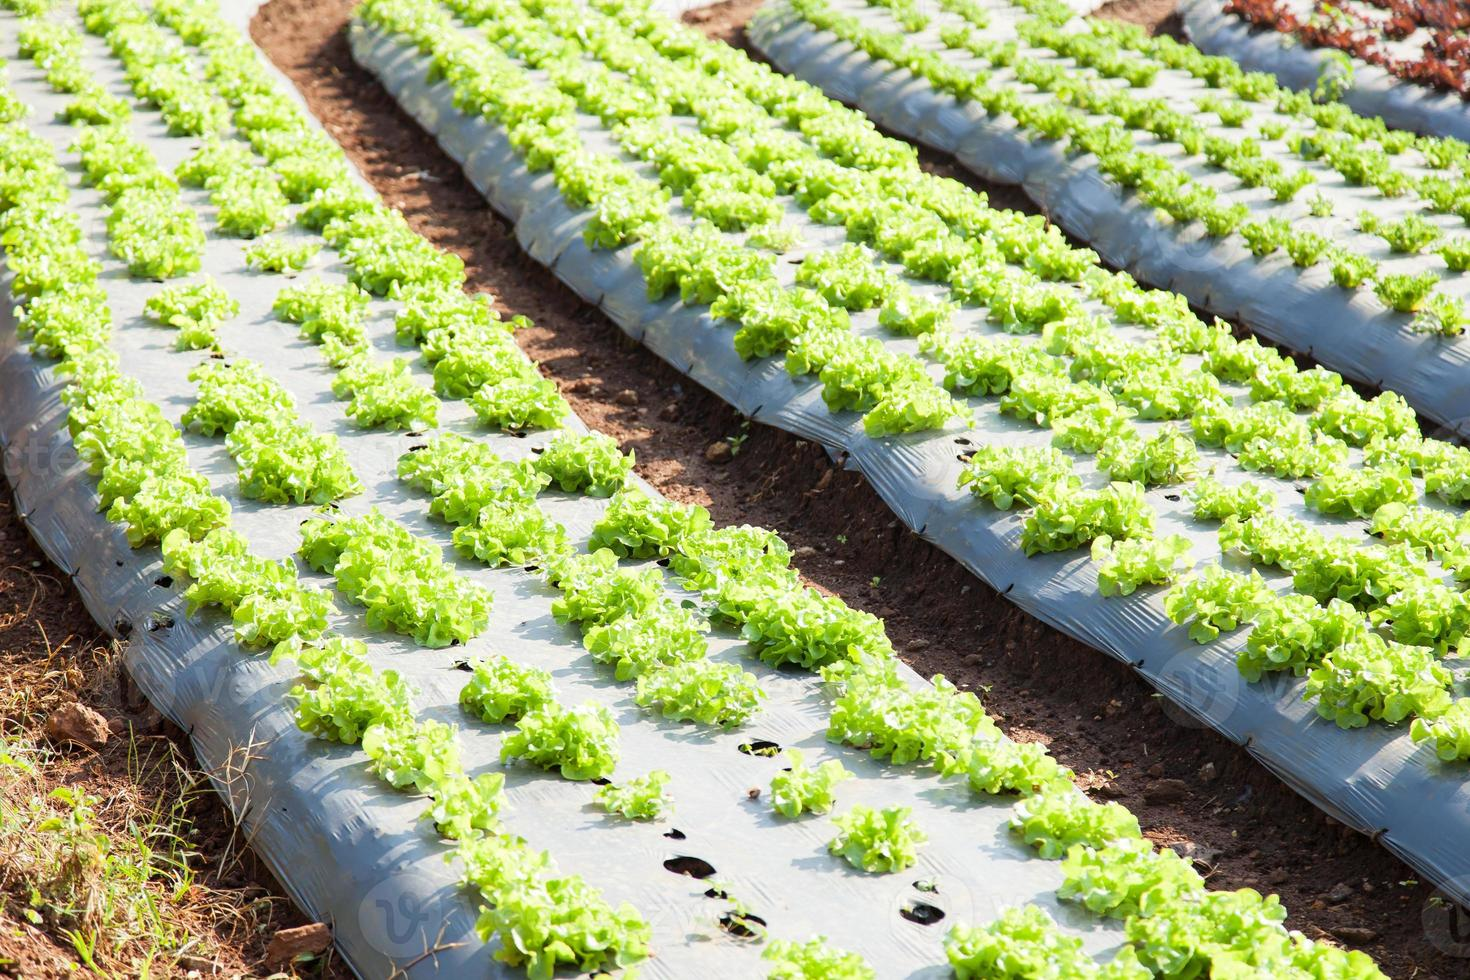 groenten geplant in percelen foto